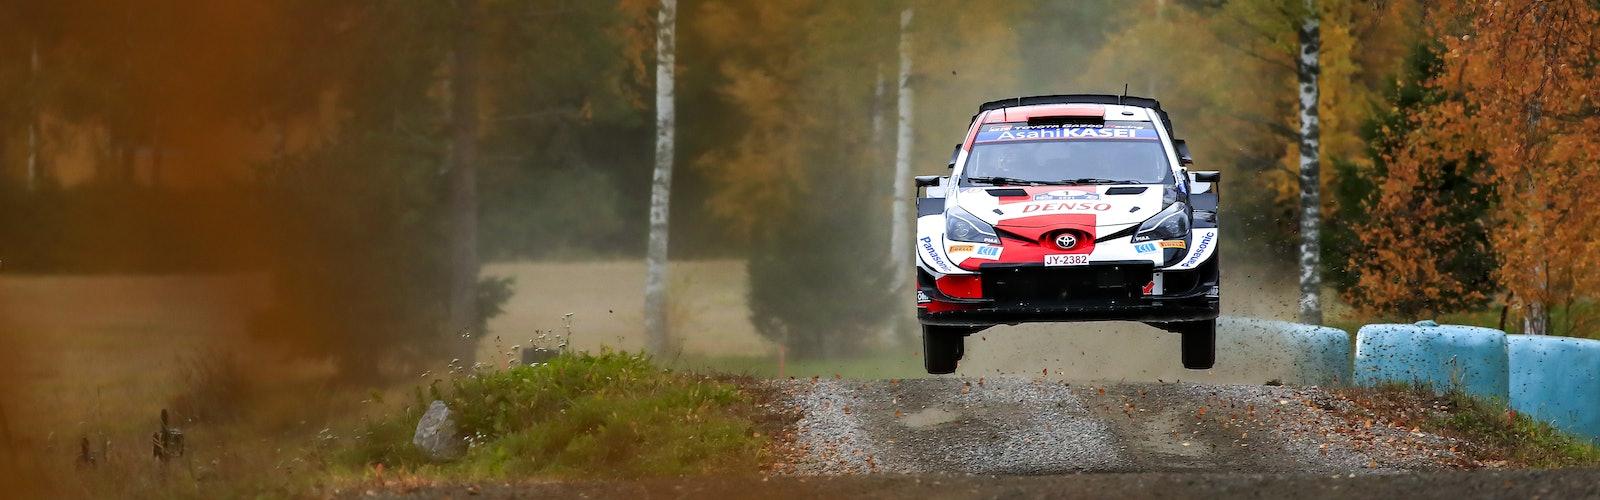 WRC_2021_Rd.10_137